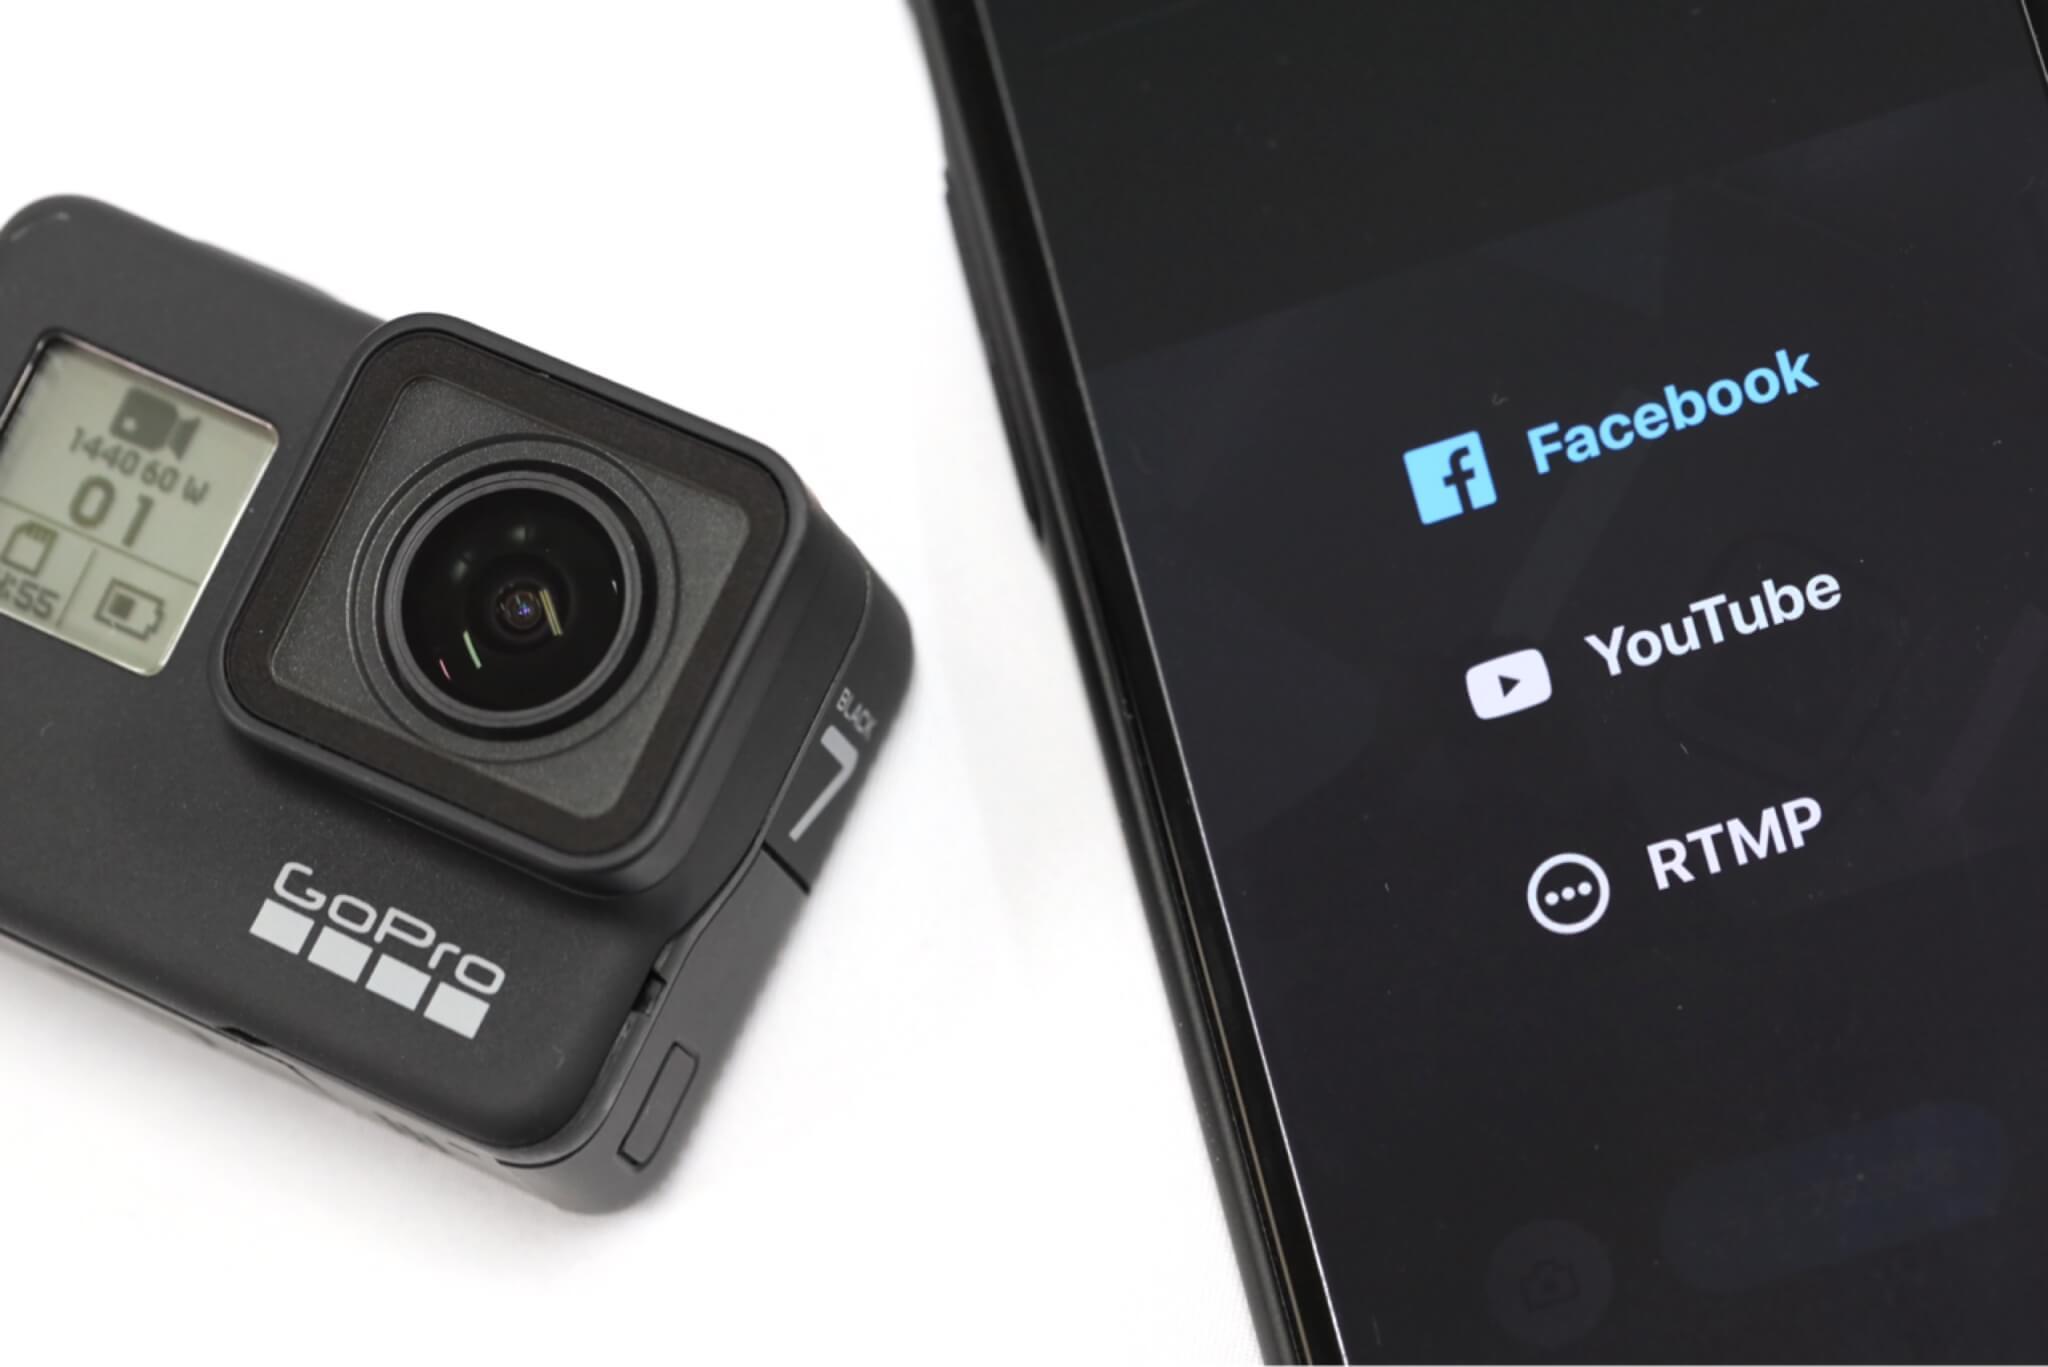 GoPro HERO7 Blackでライブストリーミング!設定から配信までの手順を徹底解説(Facebook編)